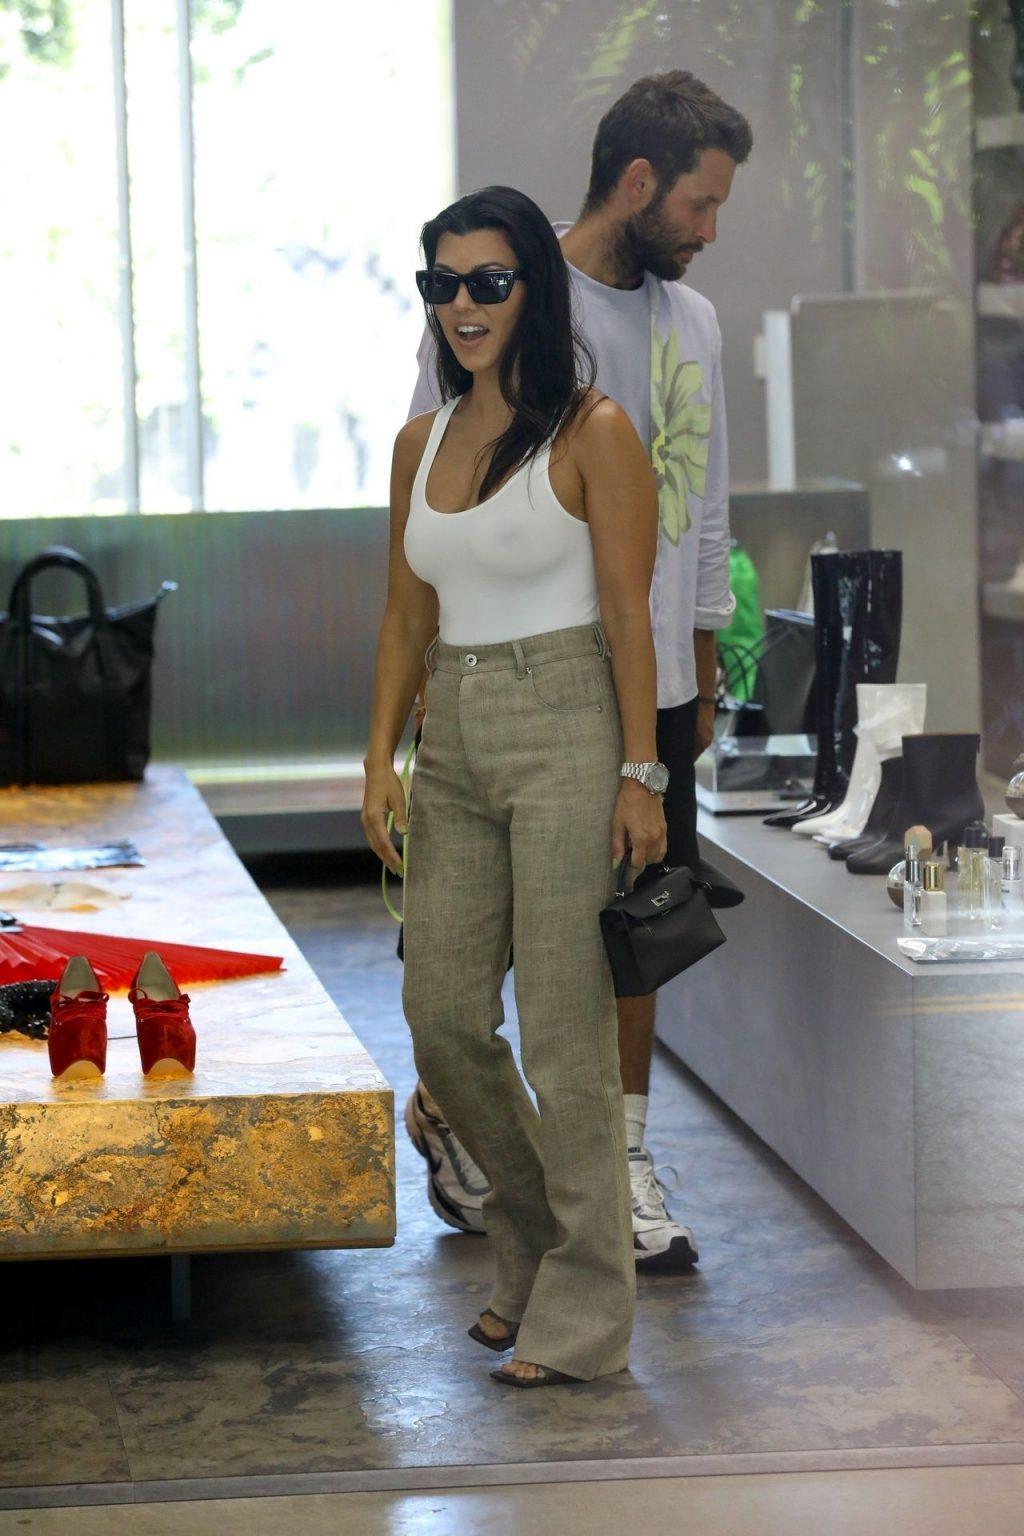 Kourtney Kardashian See Through Thefappeningblog Com 138 102